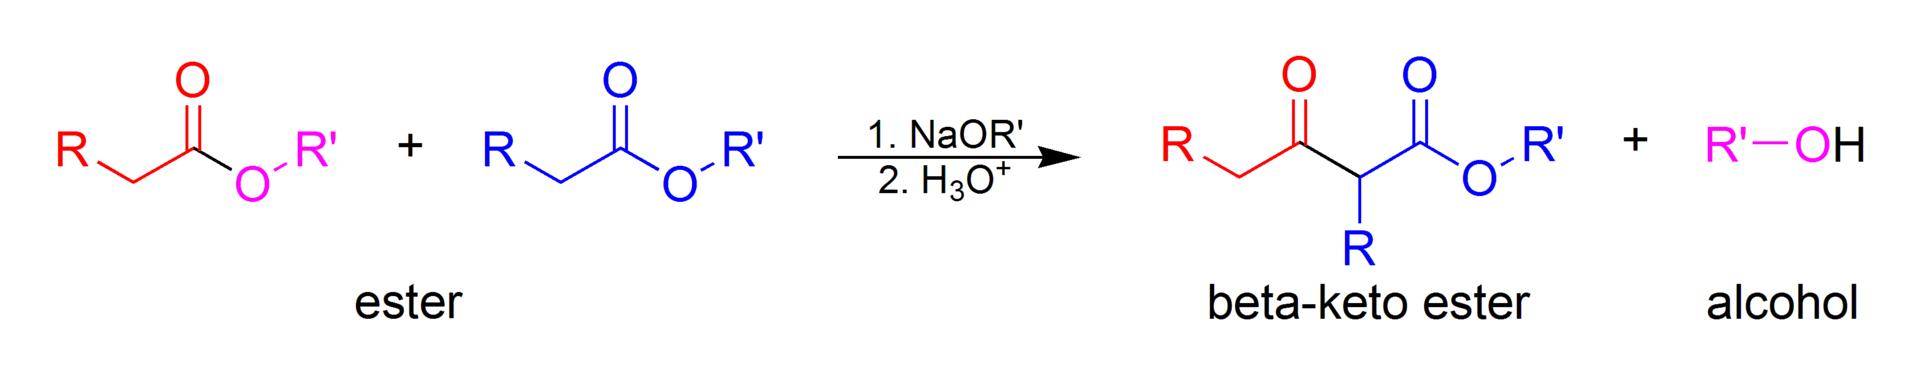 Difference Between Claisen and Dieckmann Condensation